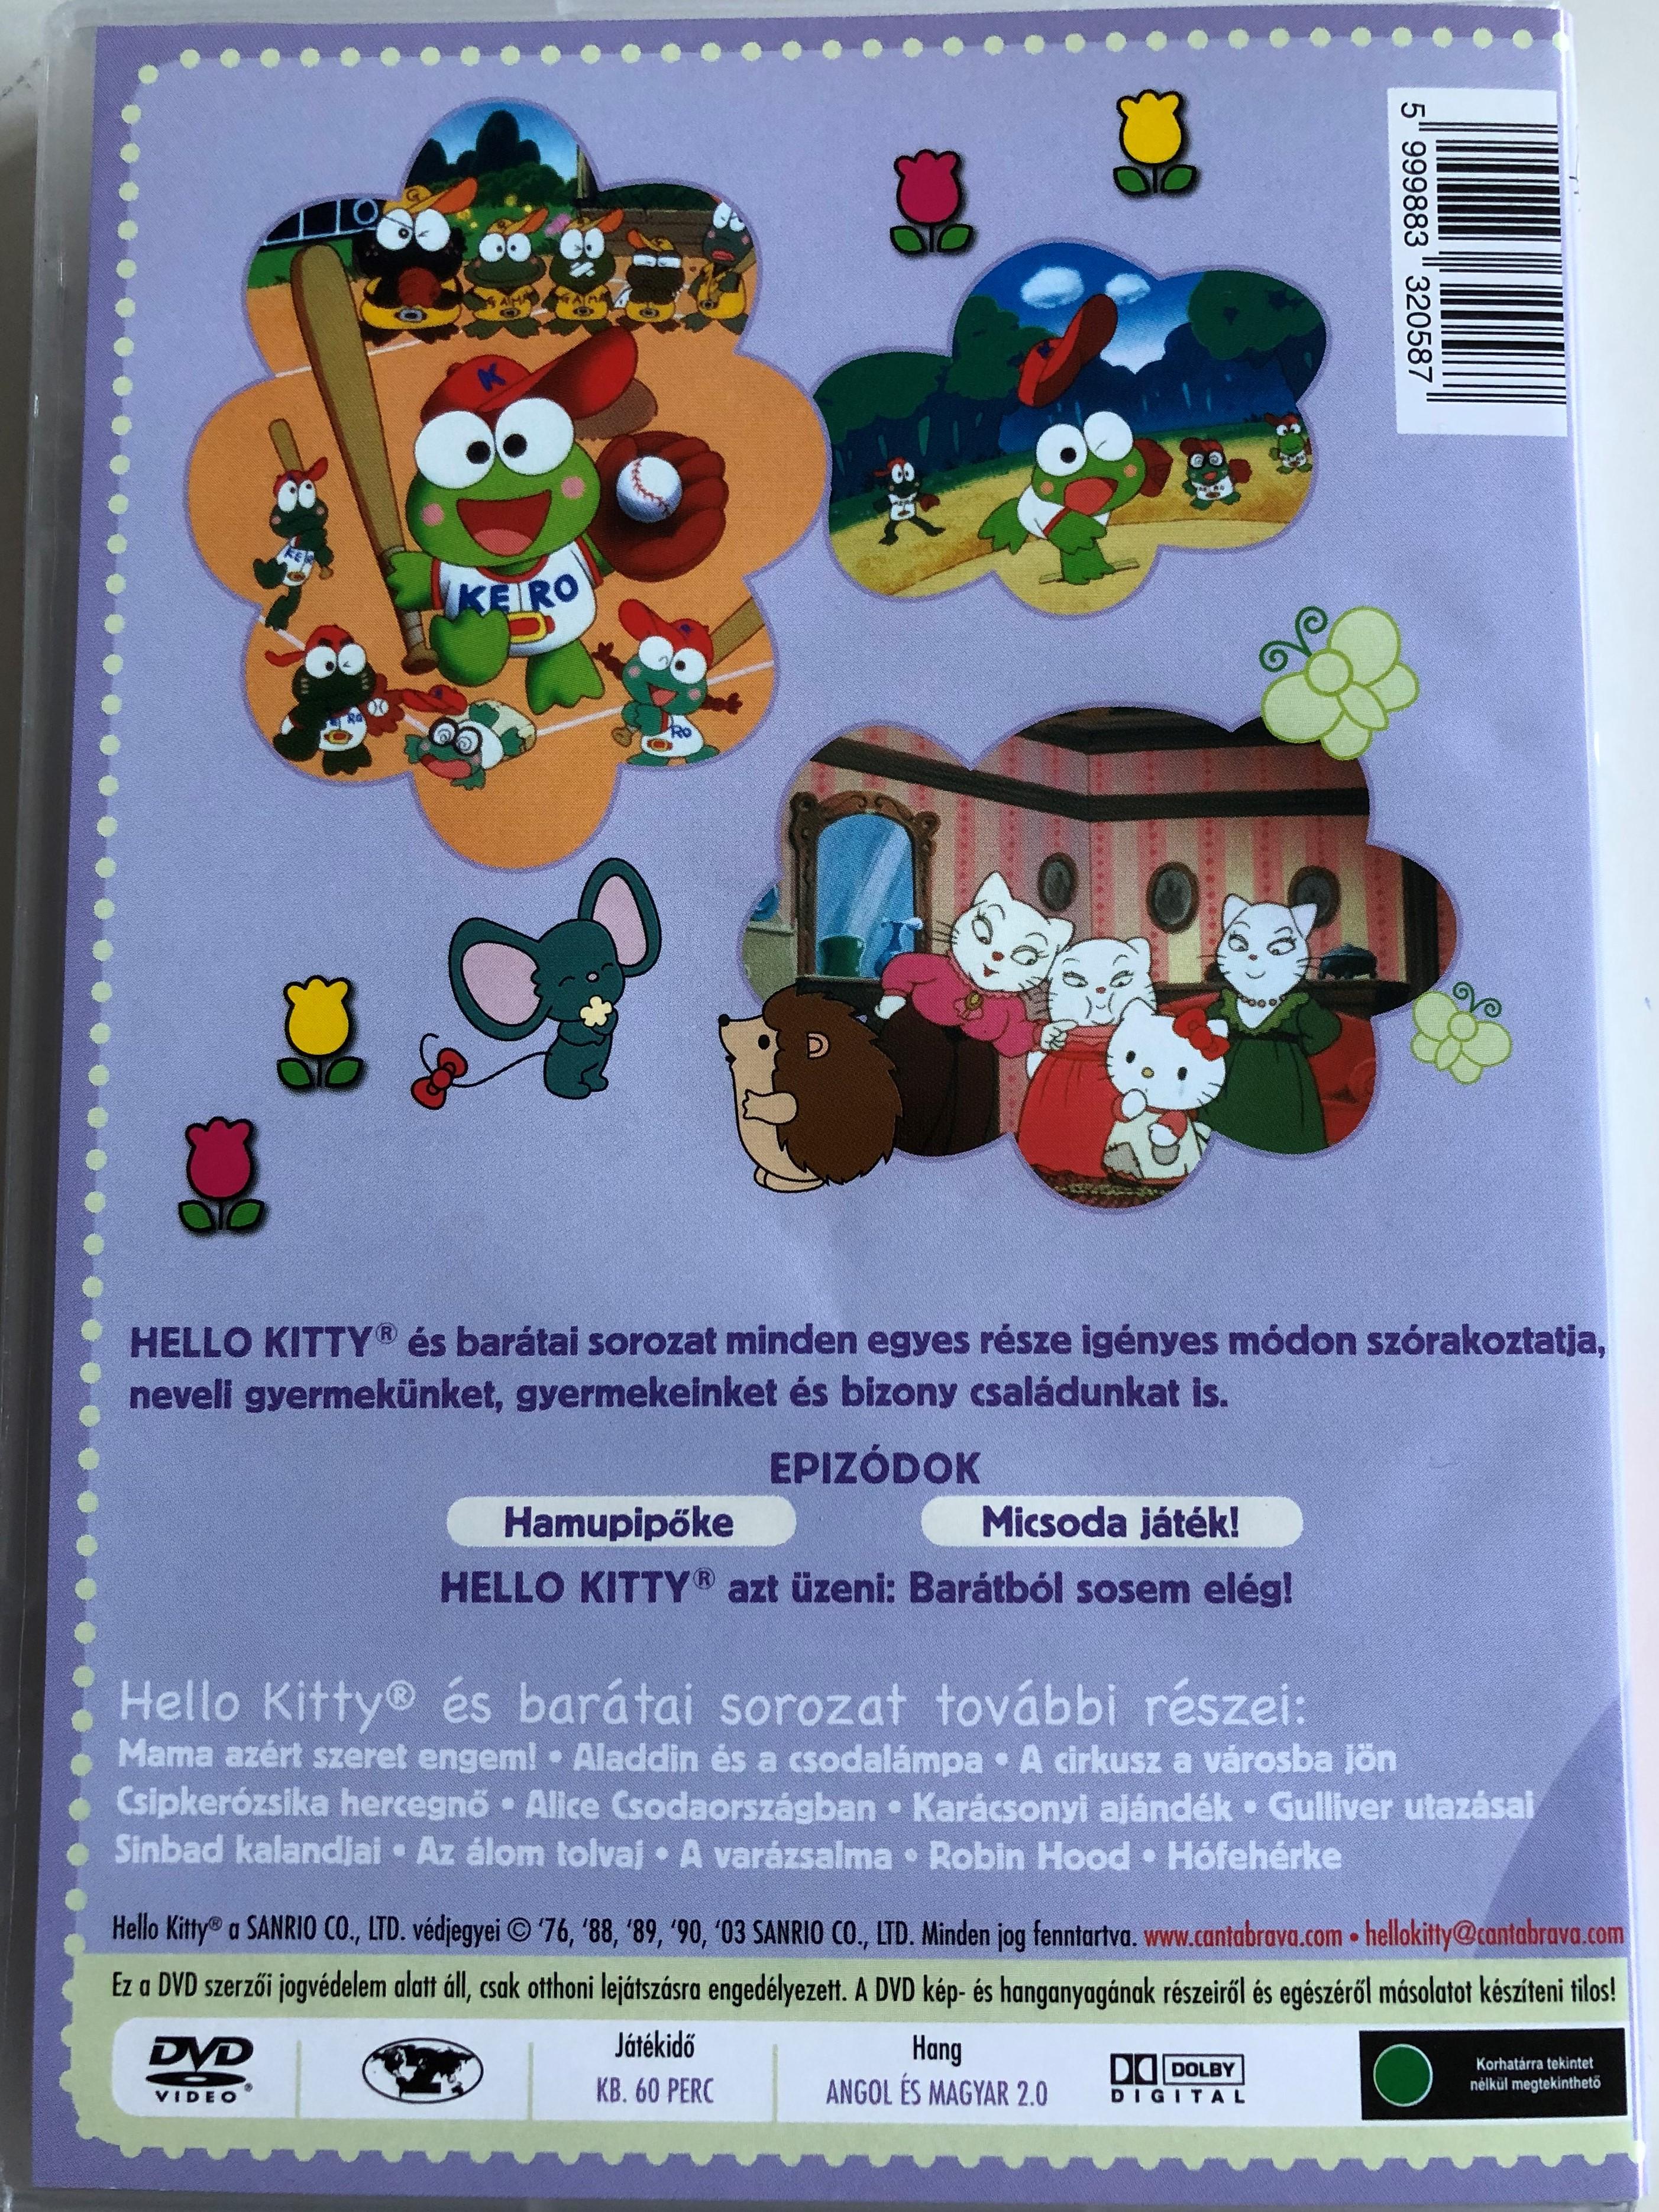 hello-kitty-s-bar-tai-hamupi-ke-dvd-2-epiz-d-2-episodes-on-disc-2-.jpg